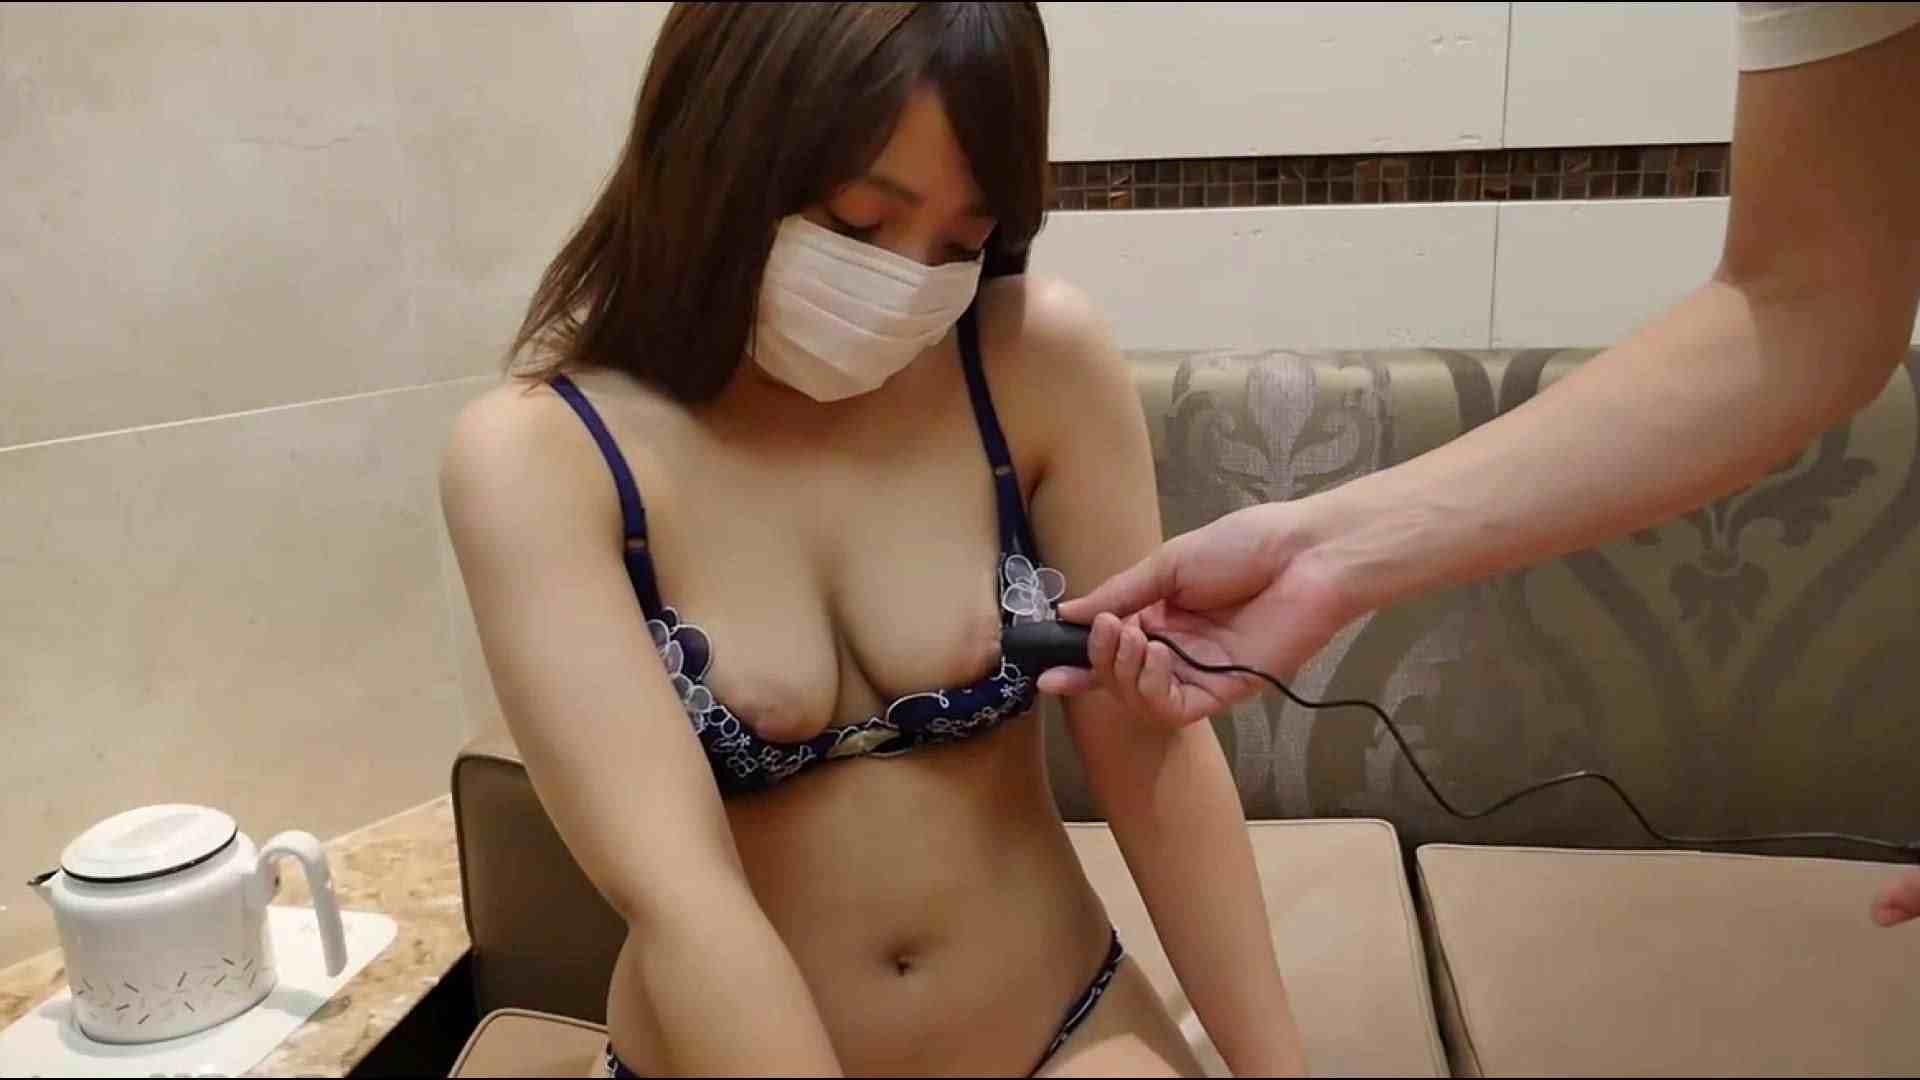 S級厳選美女ビッチガールVol.41 前編 OL女体   美女  105連発 63